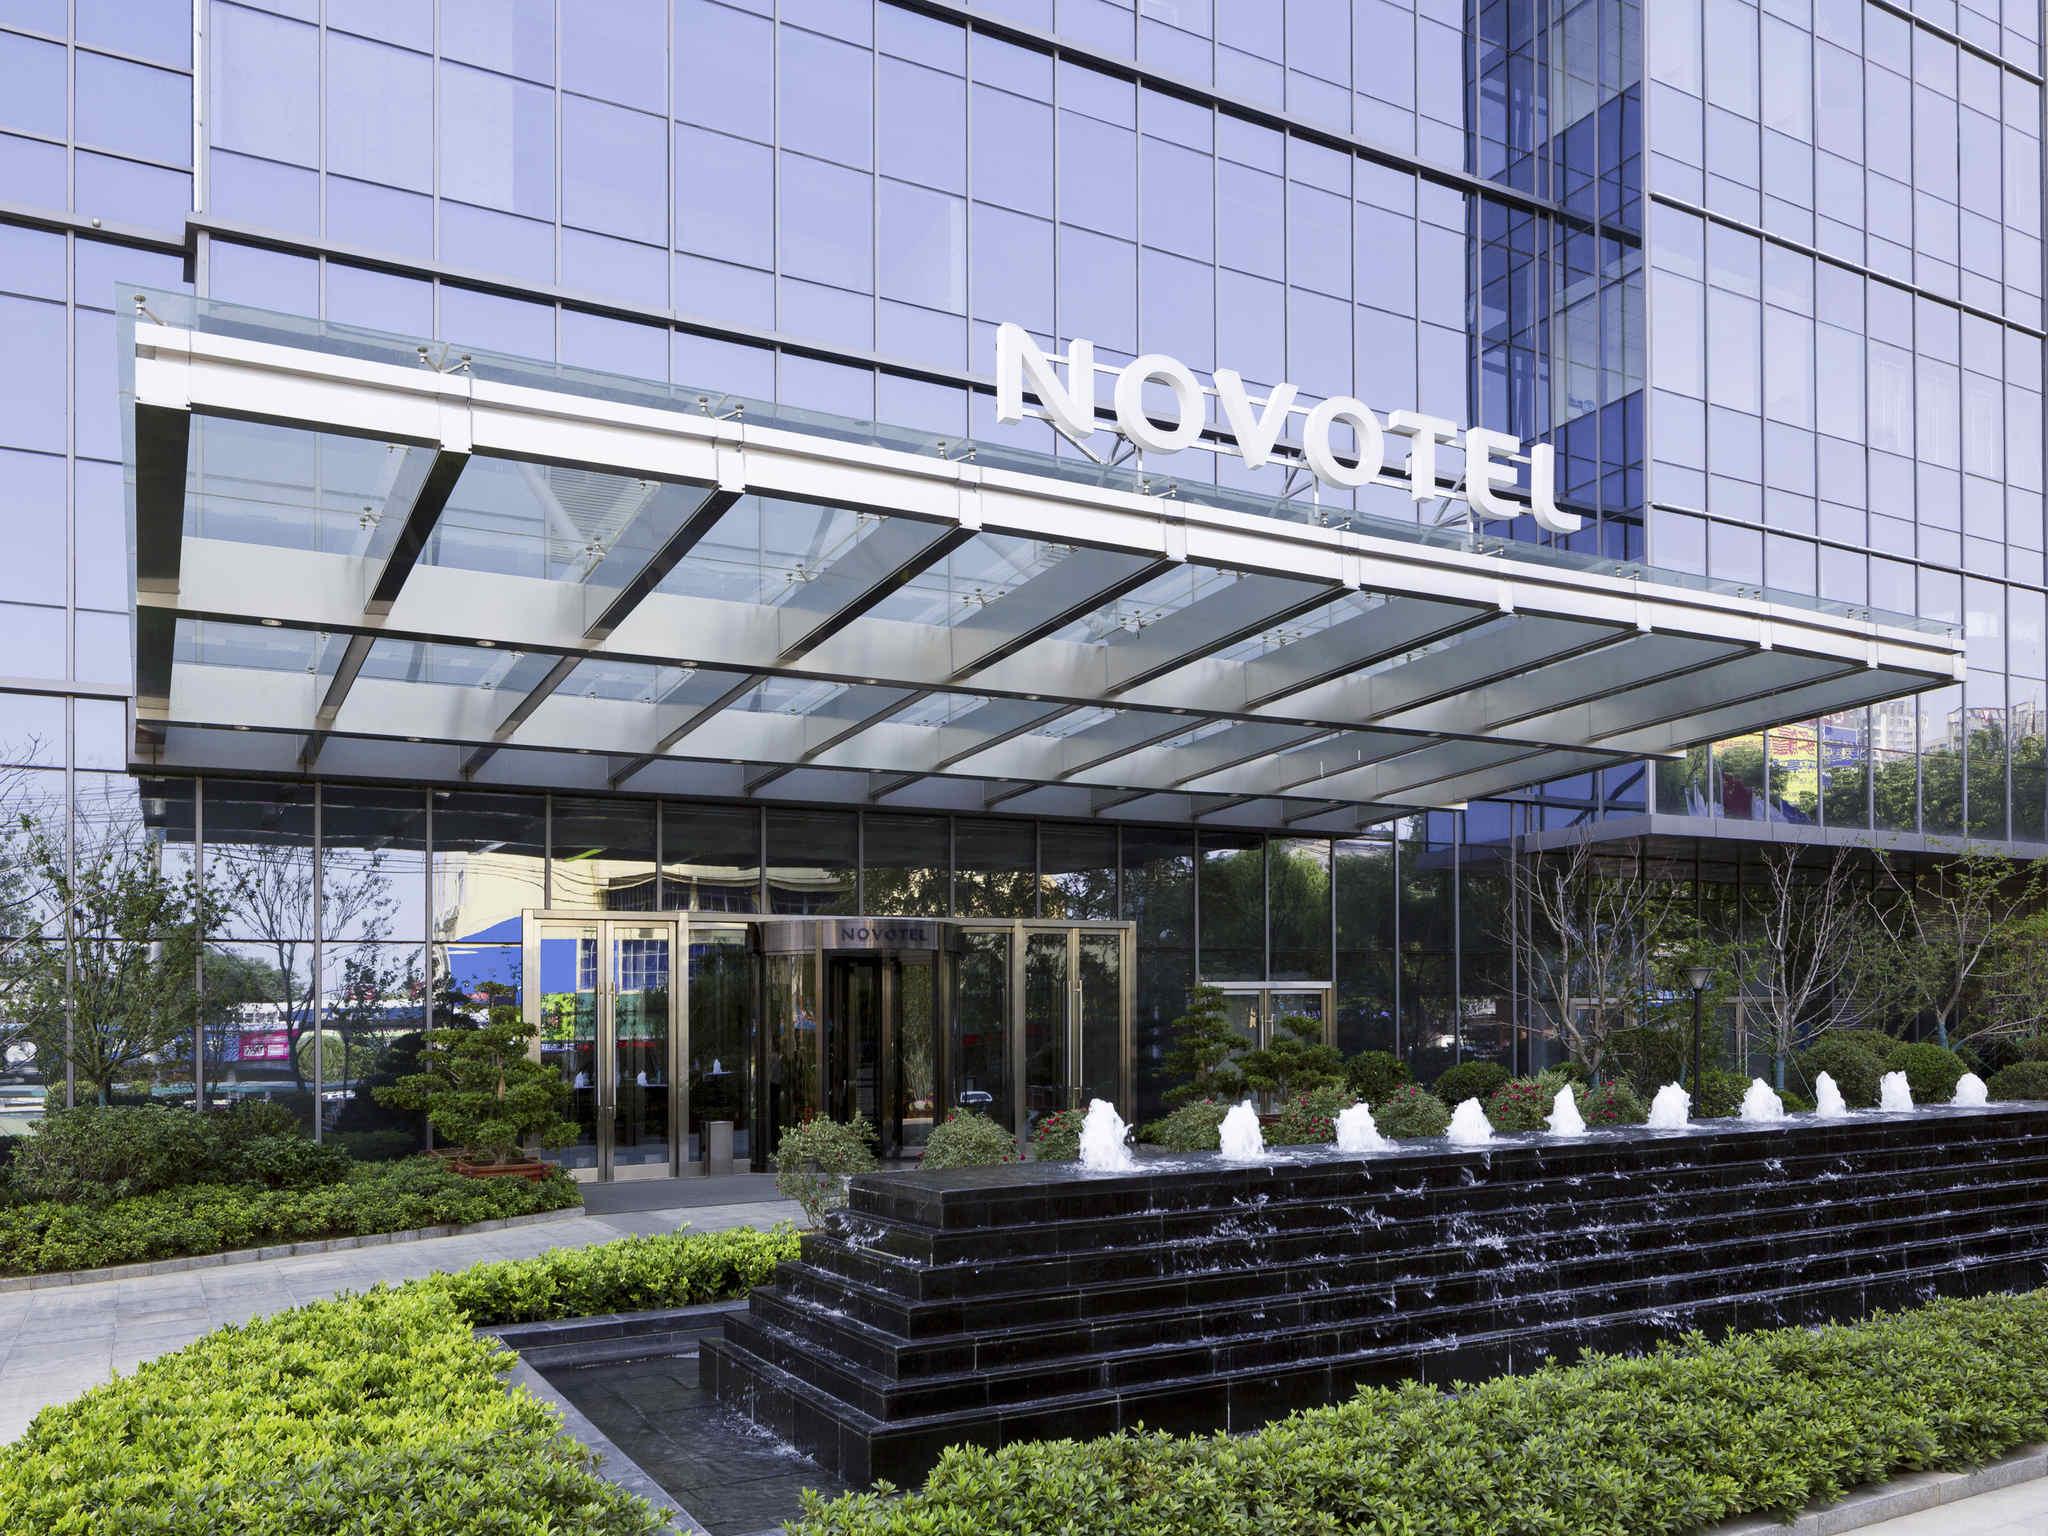 Hotell – Novotel Rizhao Suning